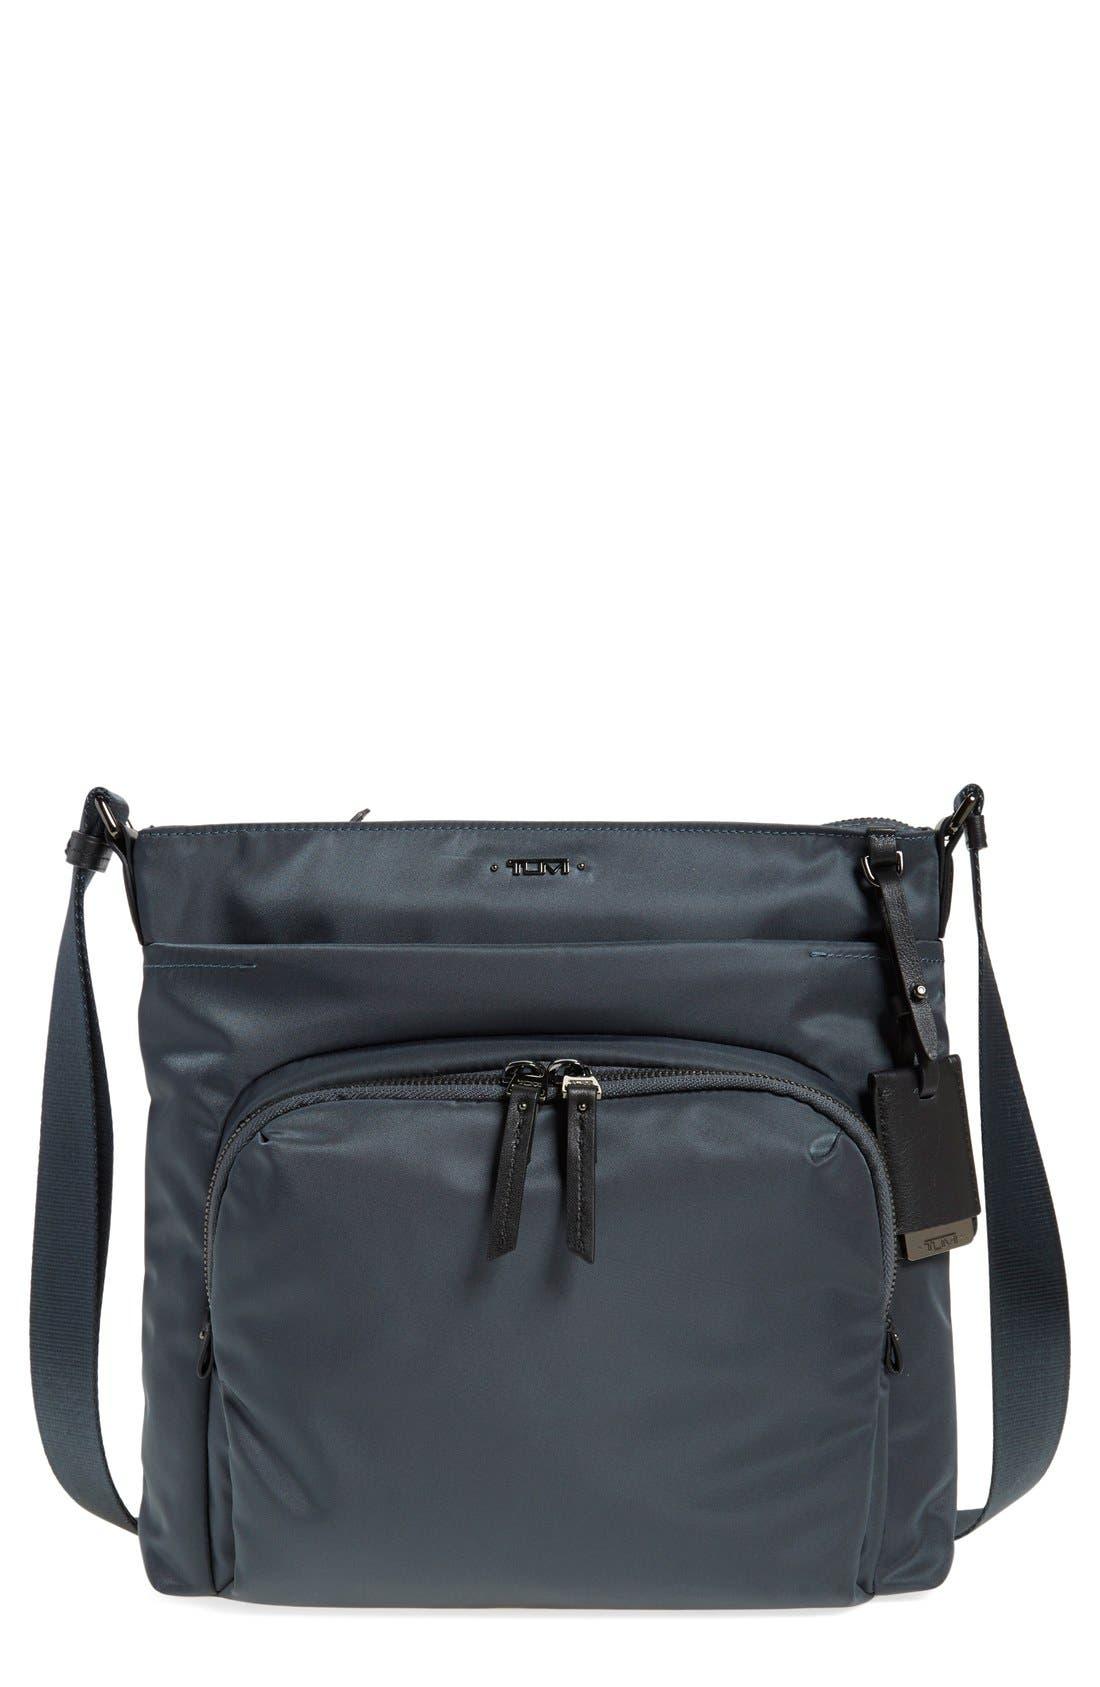 TUMI,                             'Voyageur - Capri' Crossbody Bag,                             Main thumbnail 1, color,                             020